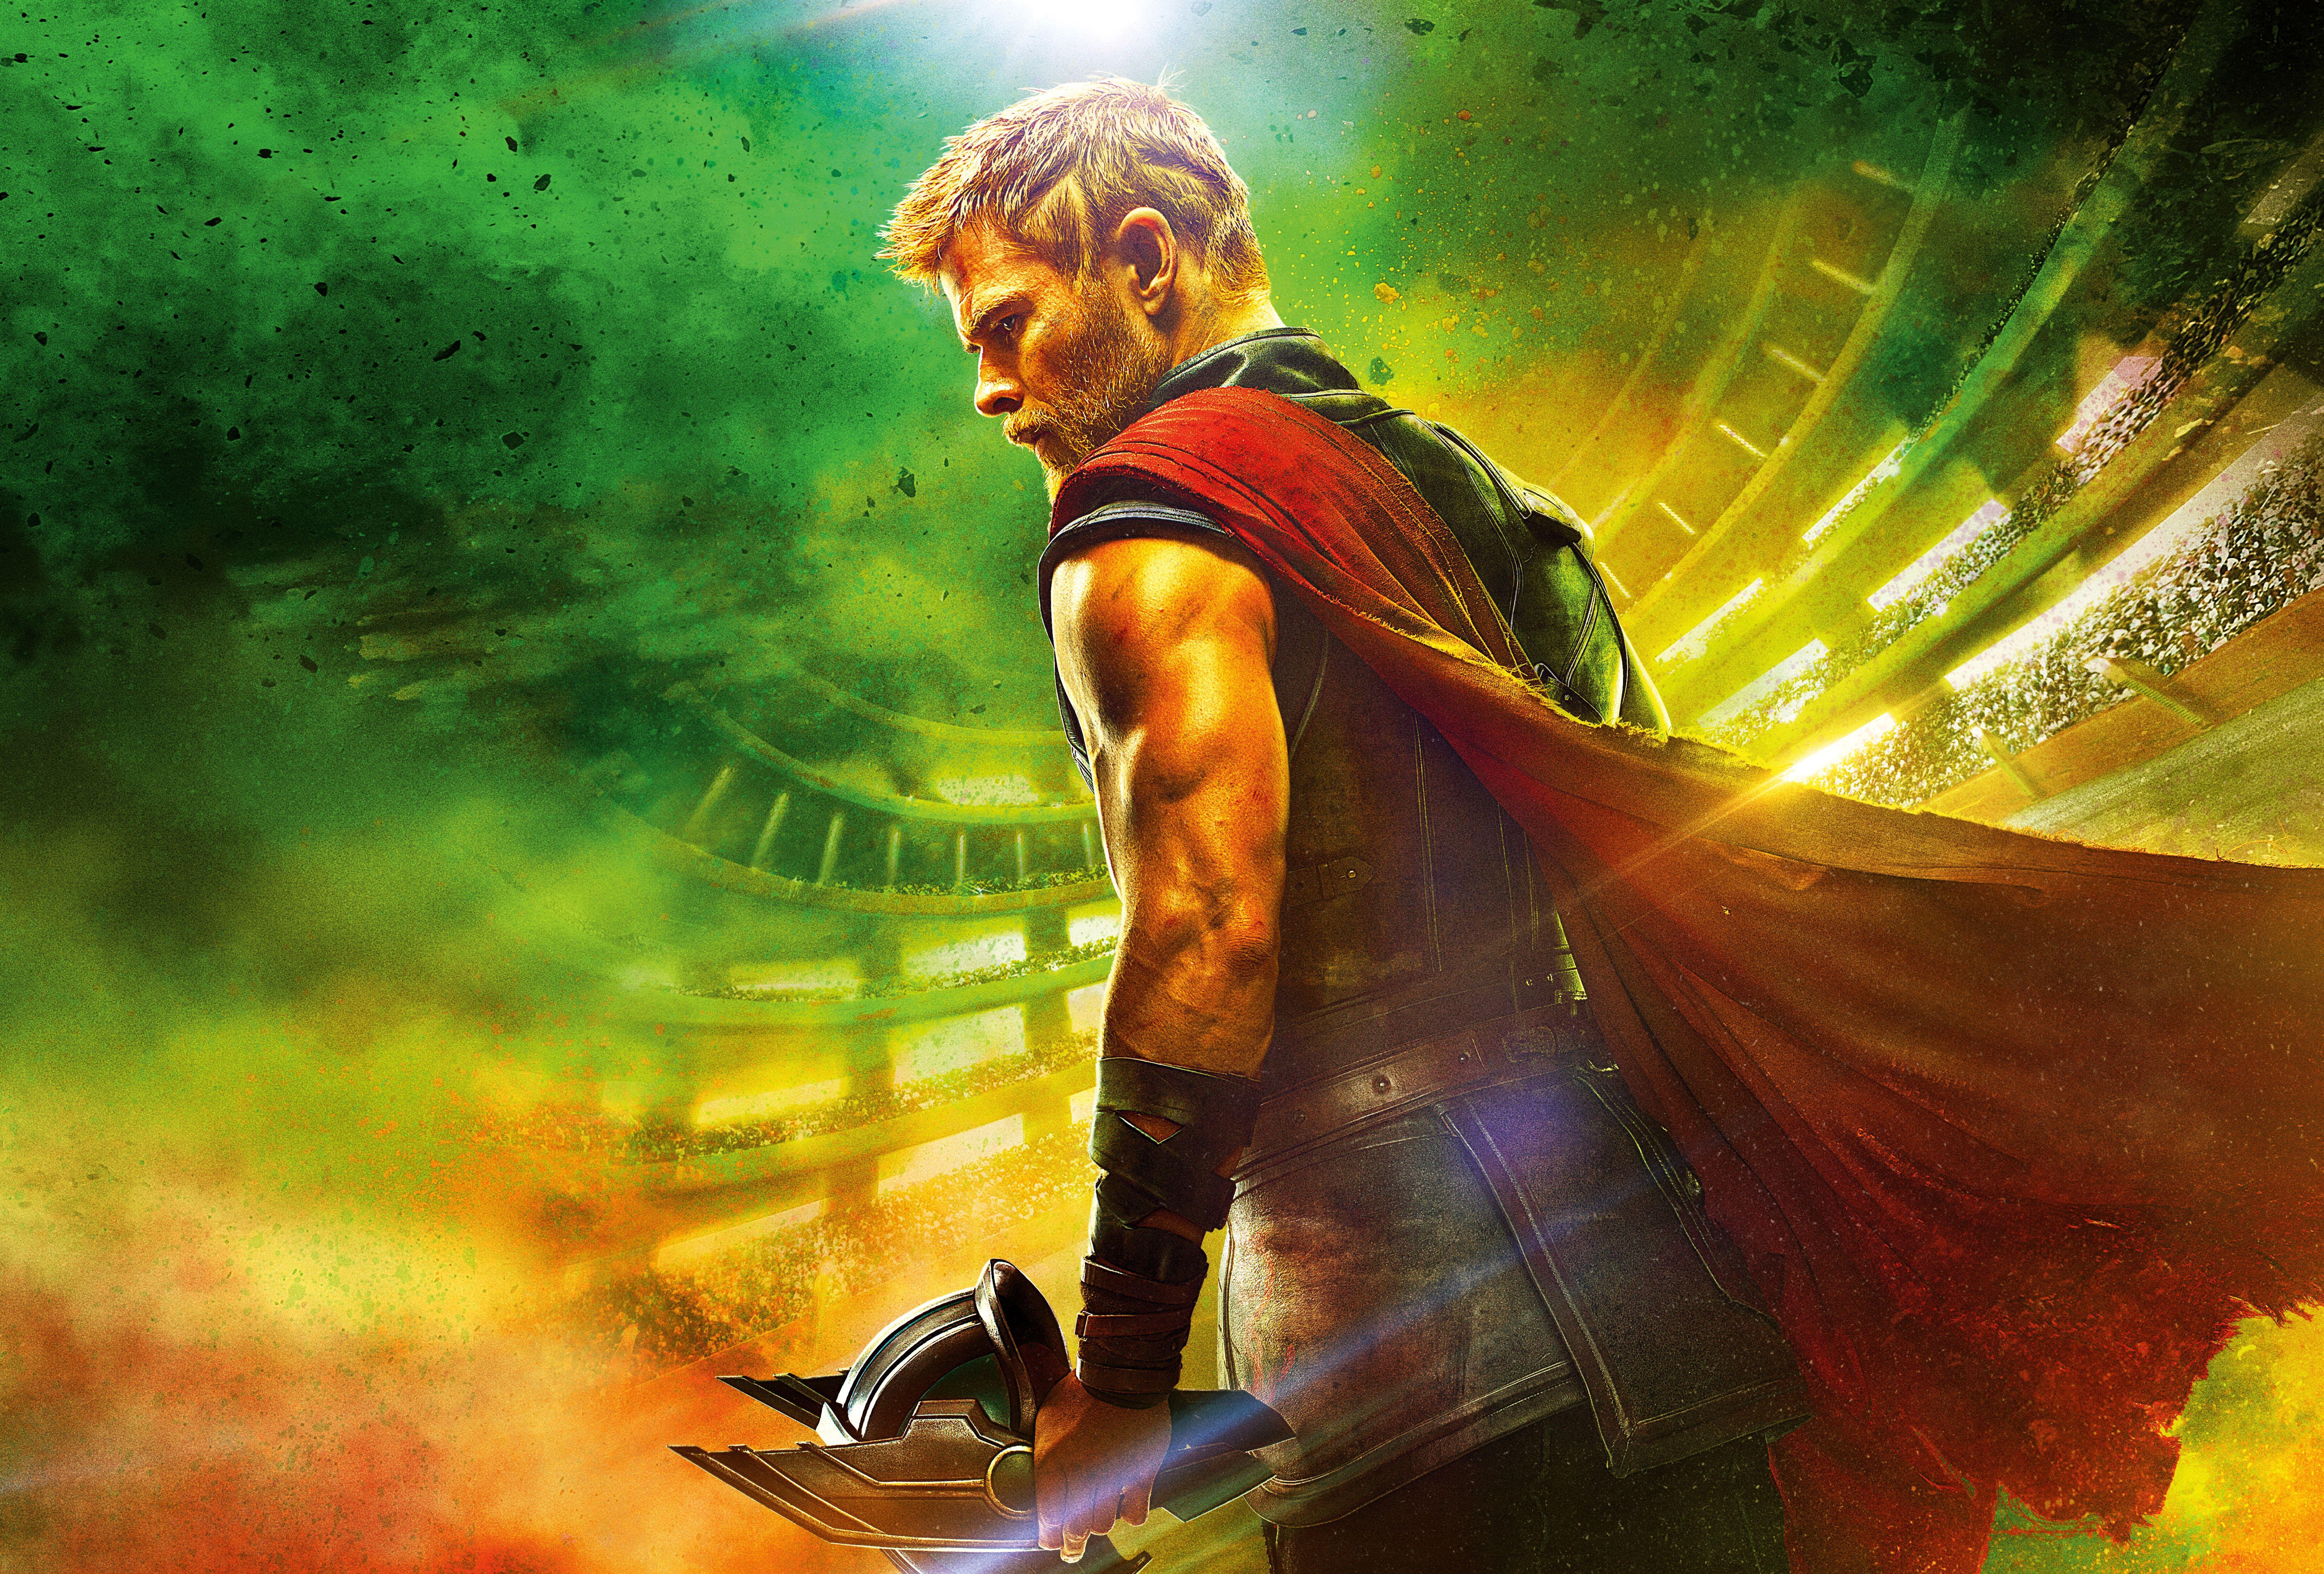 Thor Ragnarok Wallpapers Top Free Thor Ragnarok